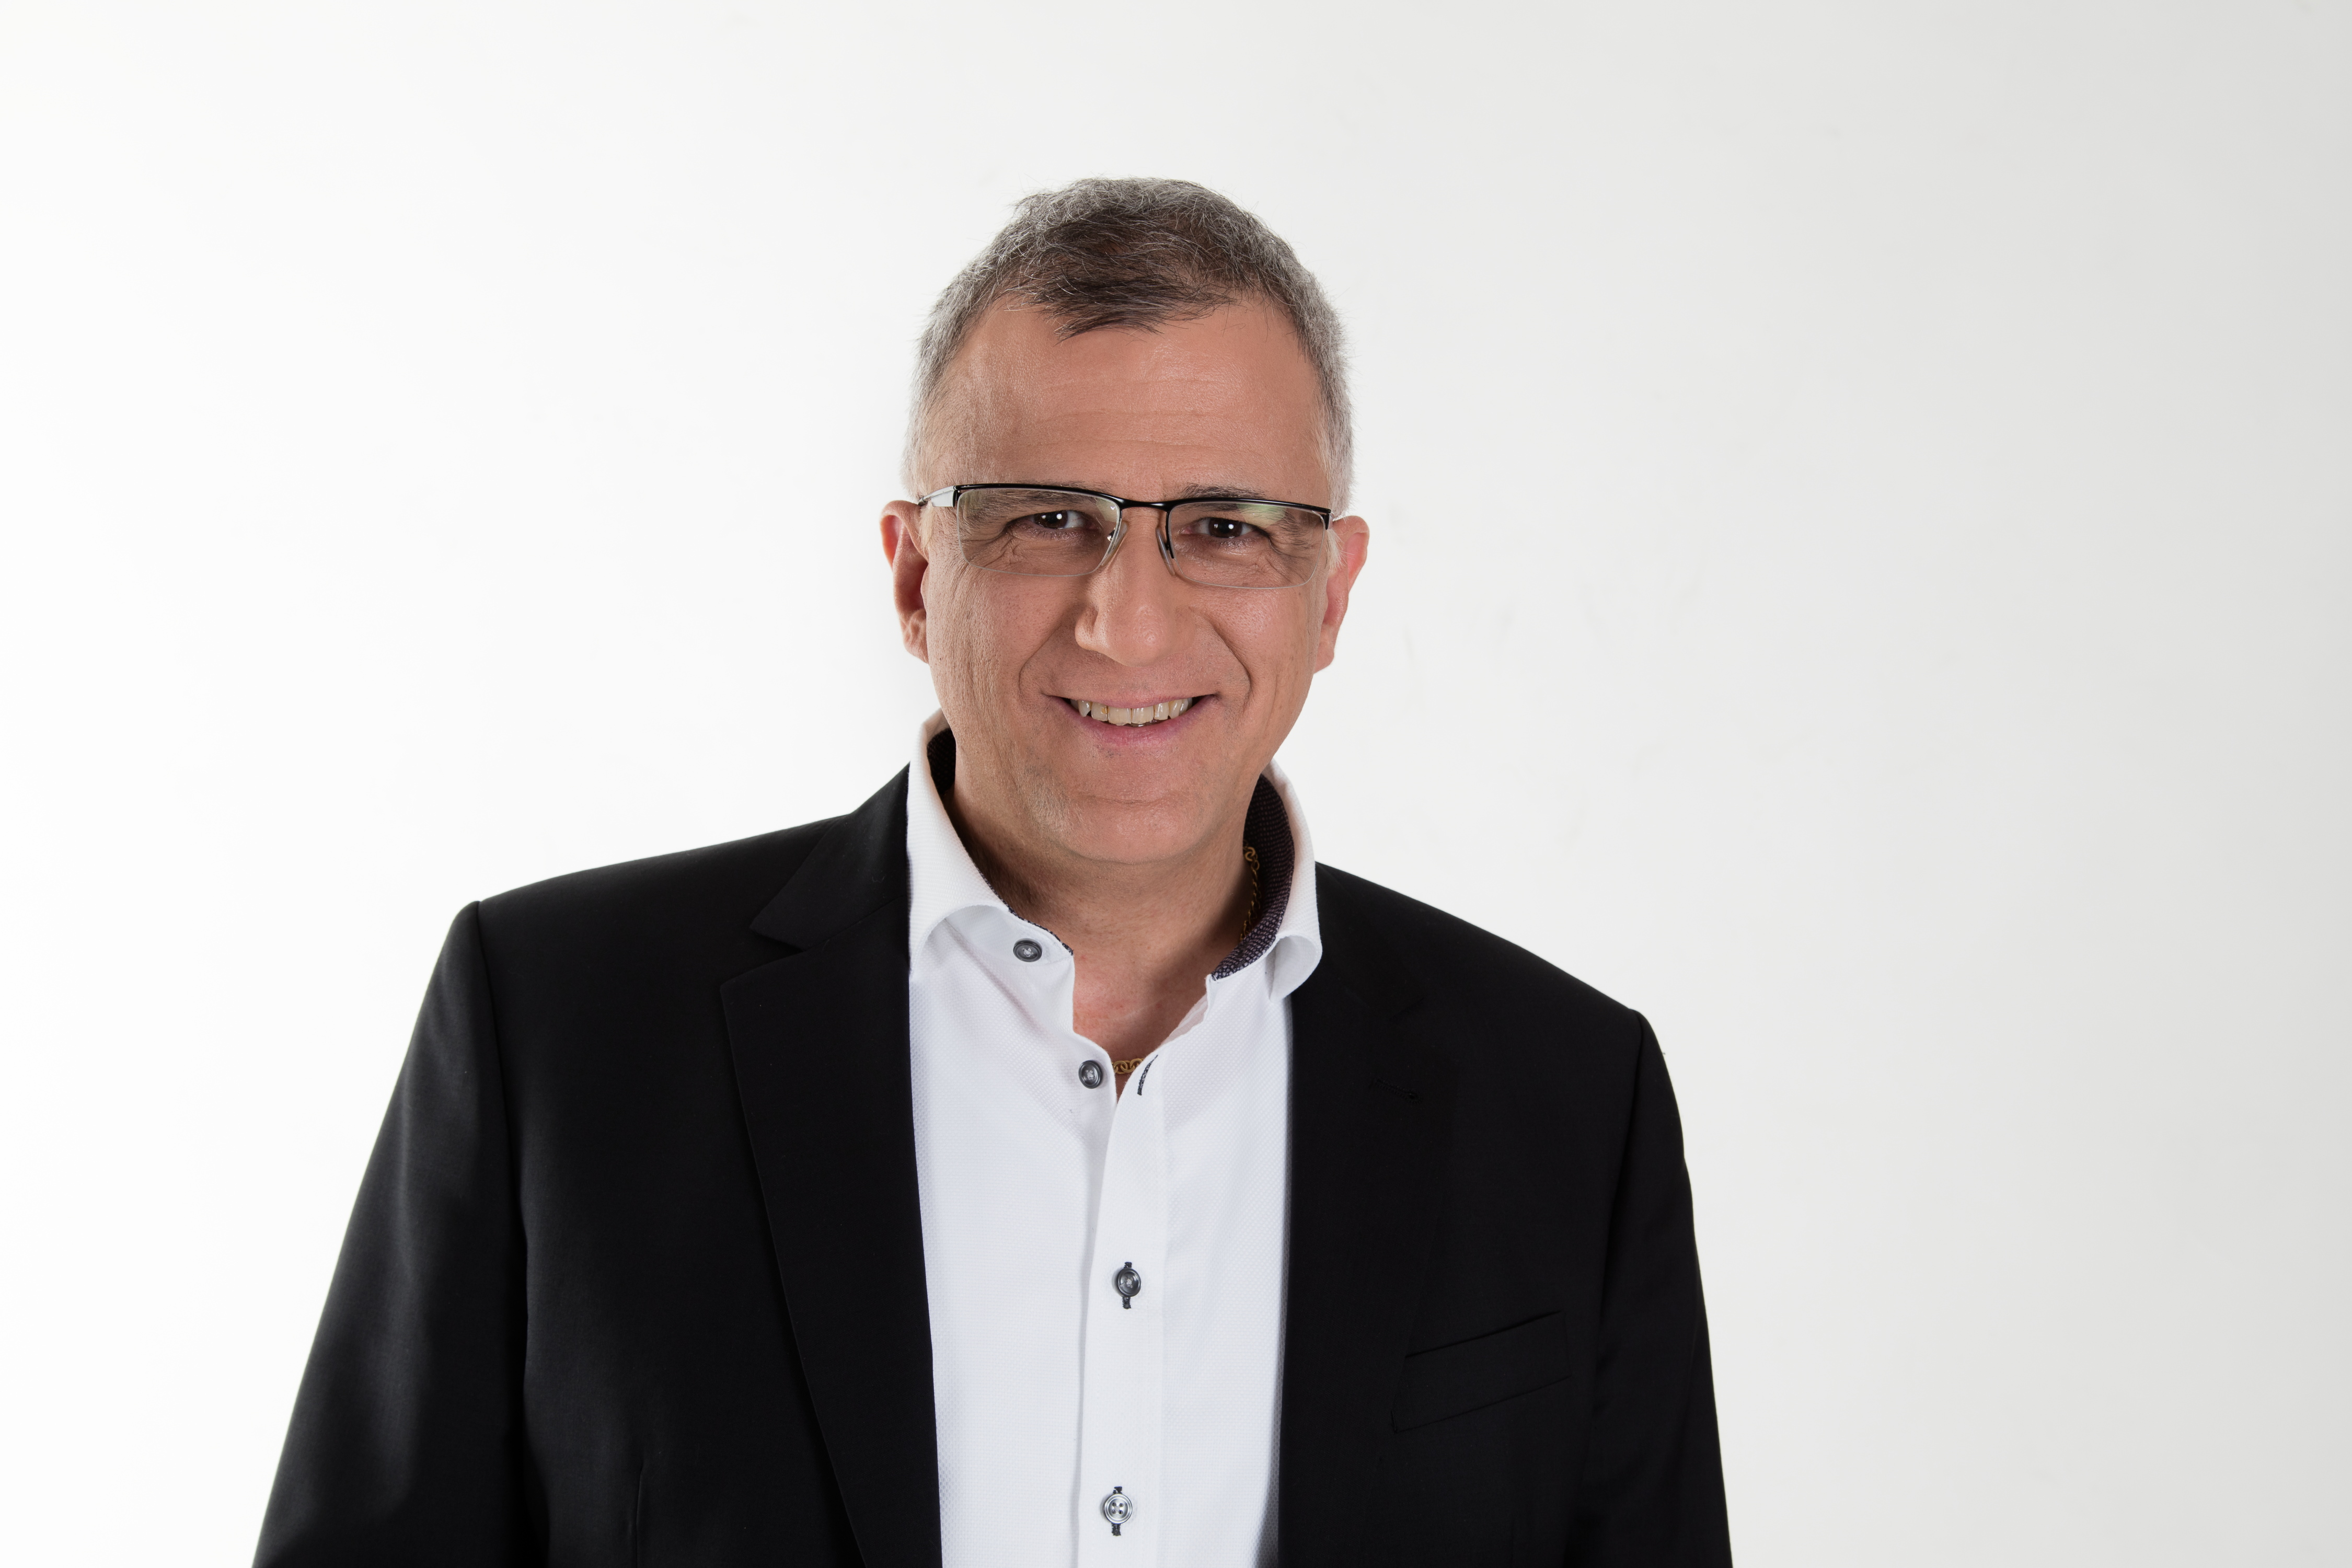 Stefano Habegger